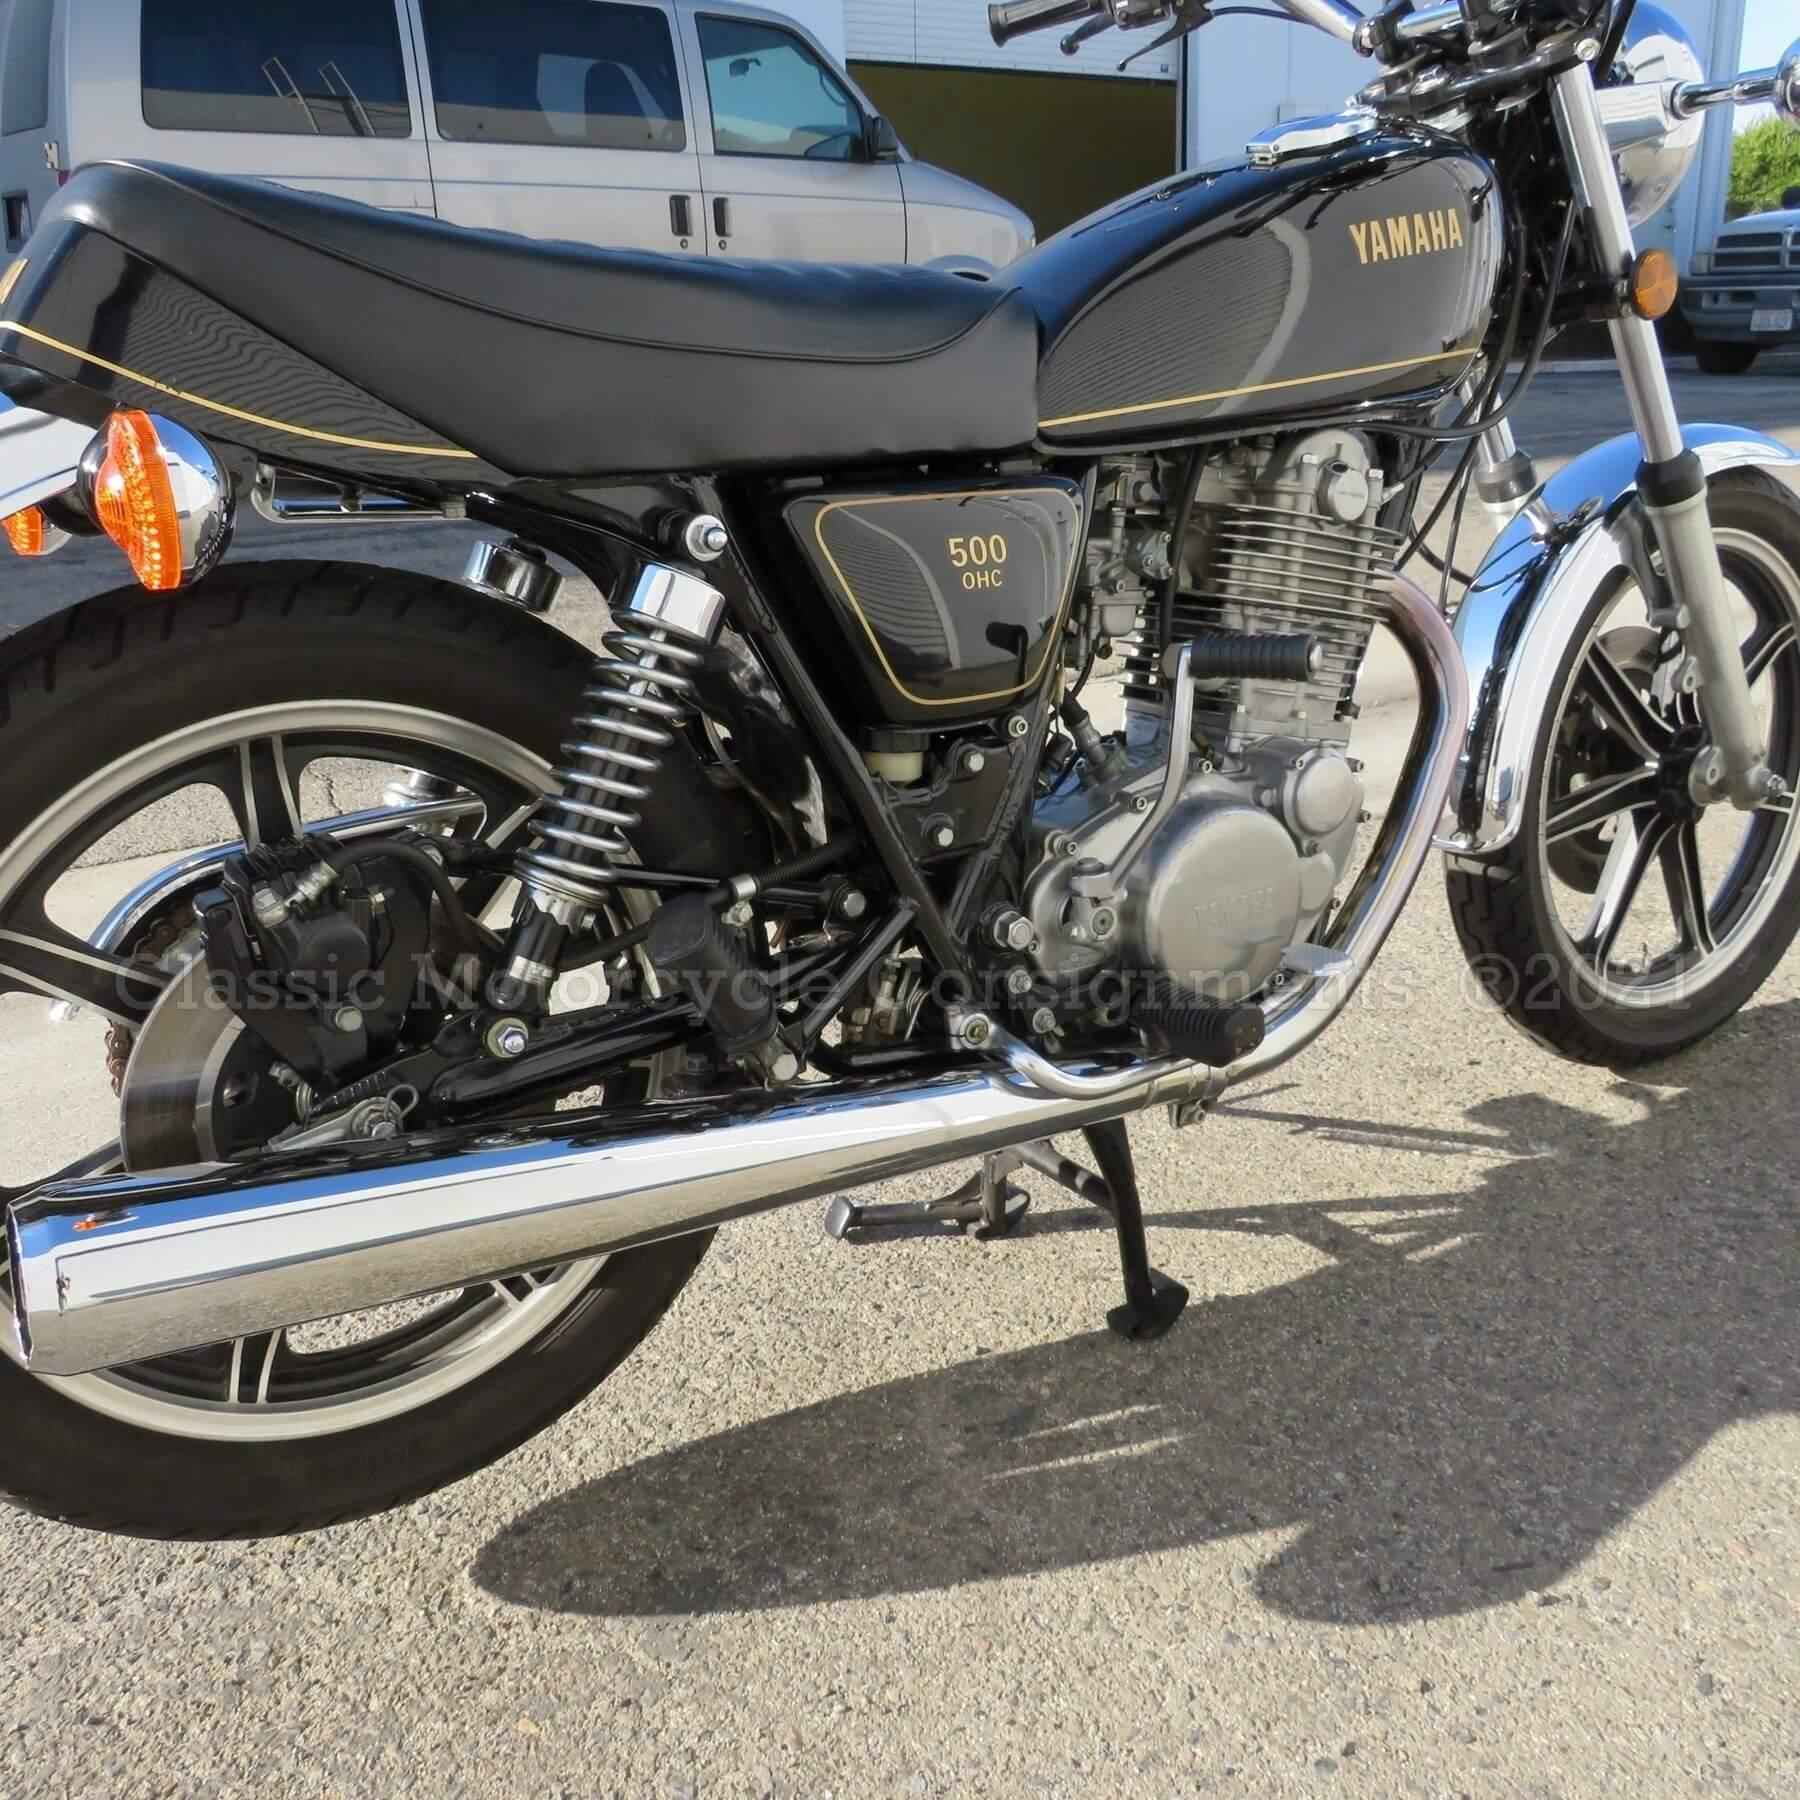 1978 Yamaha SR 500 DOC